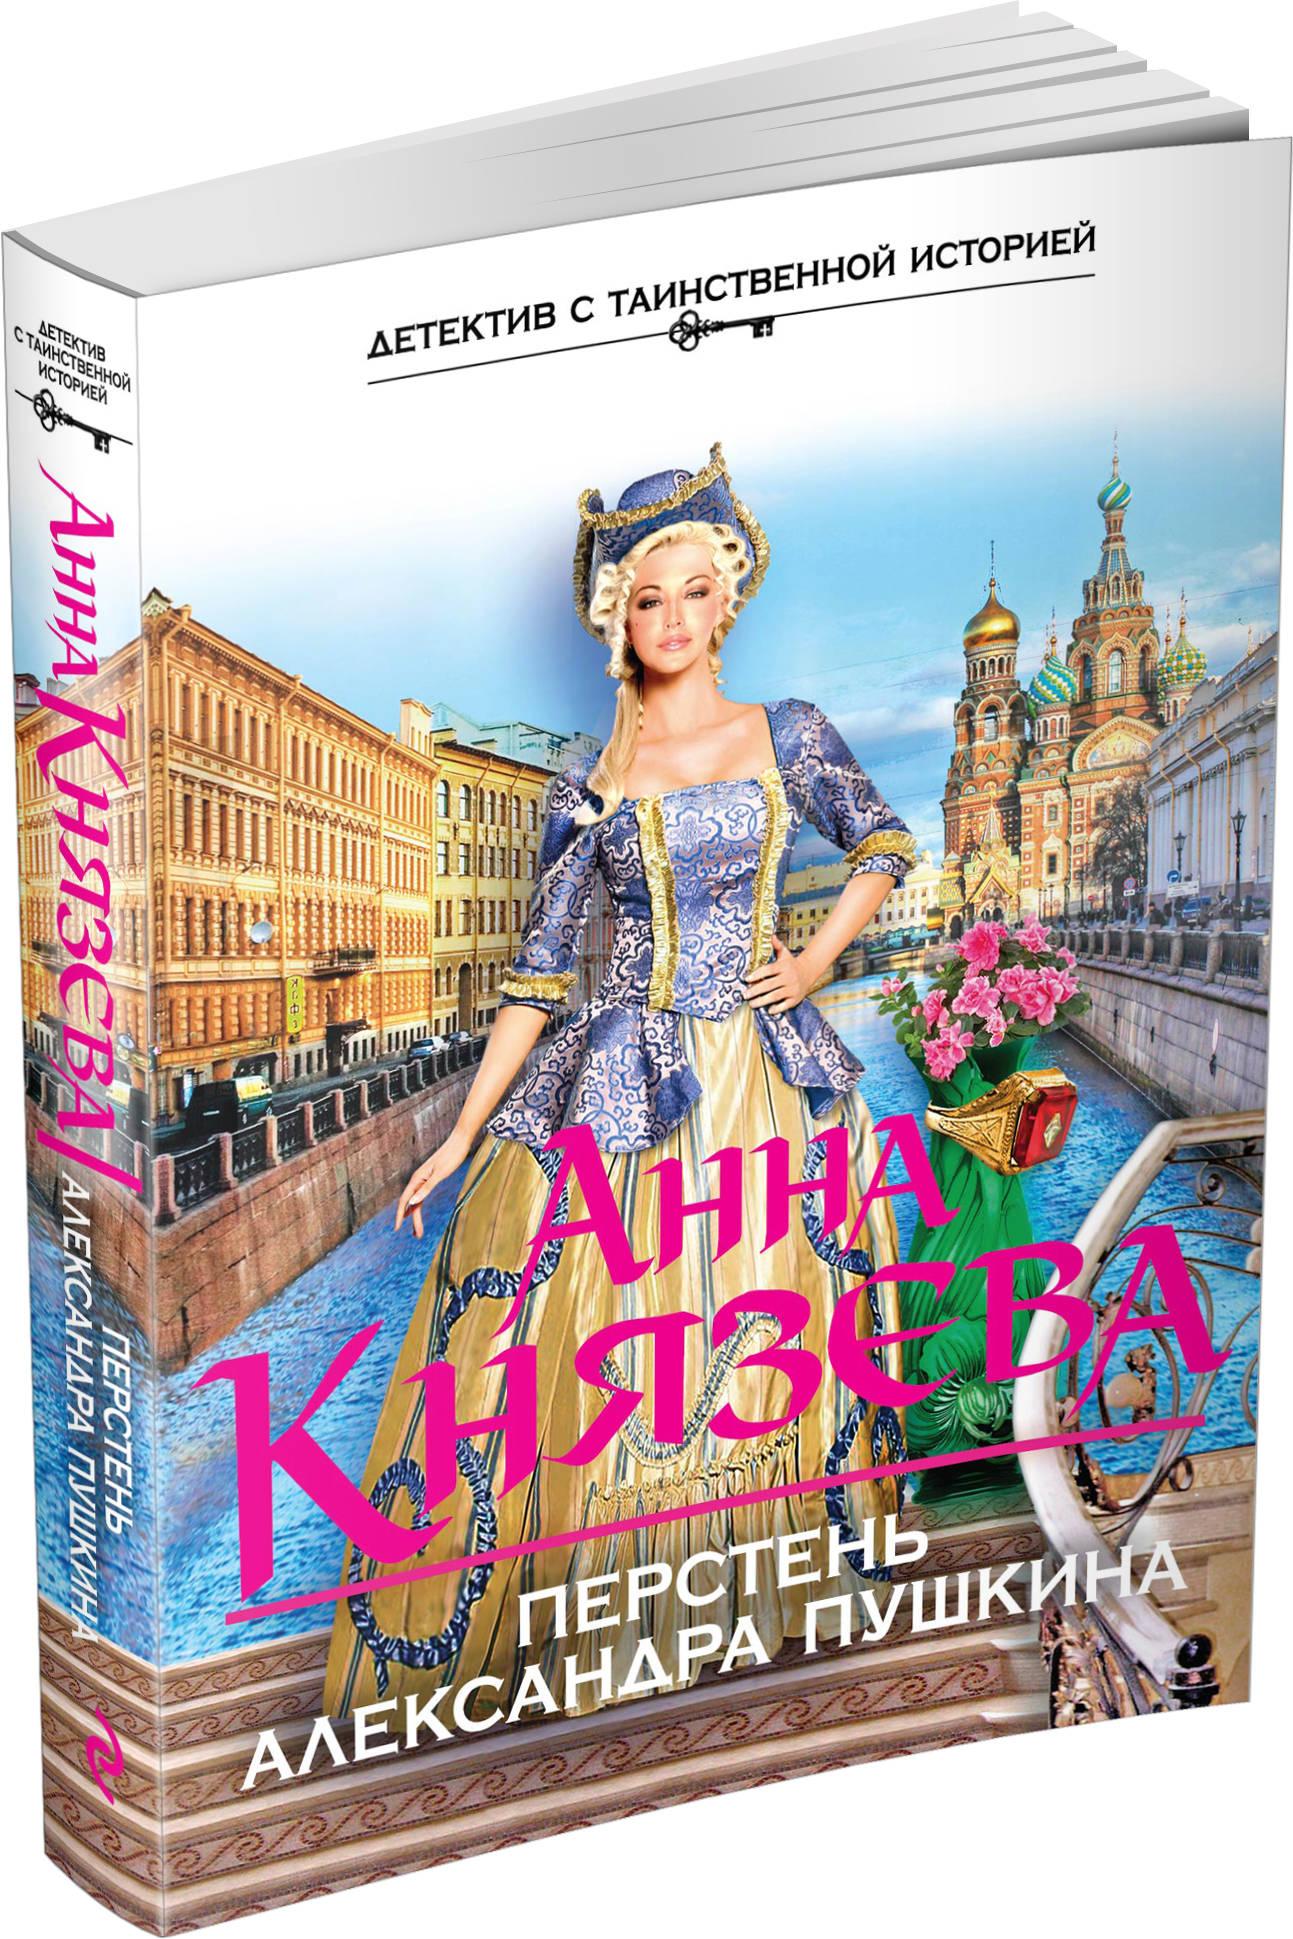 Князева А. Перстень Александра Пушкина ISBN: 978-5-699-80655-3